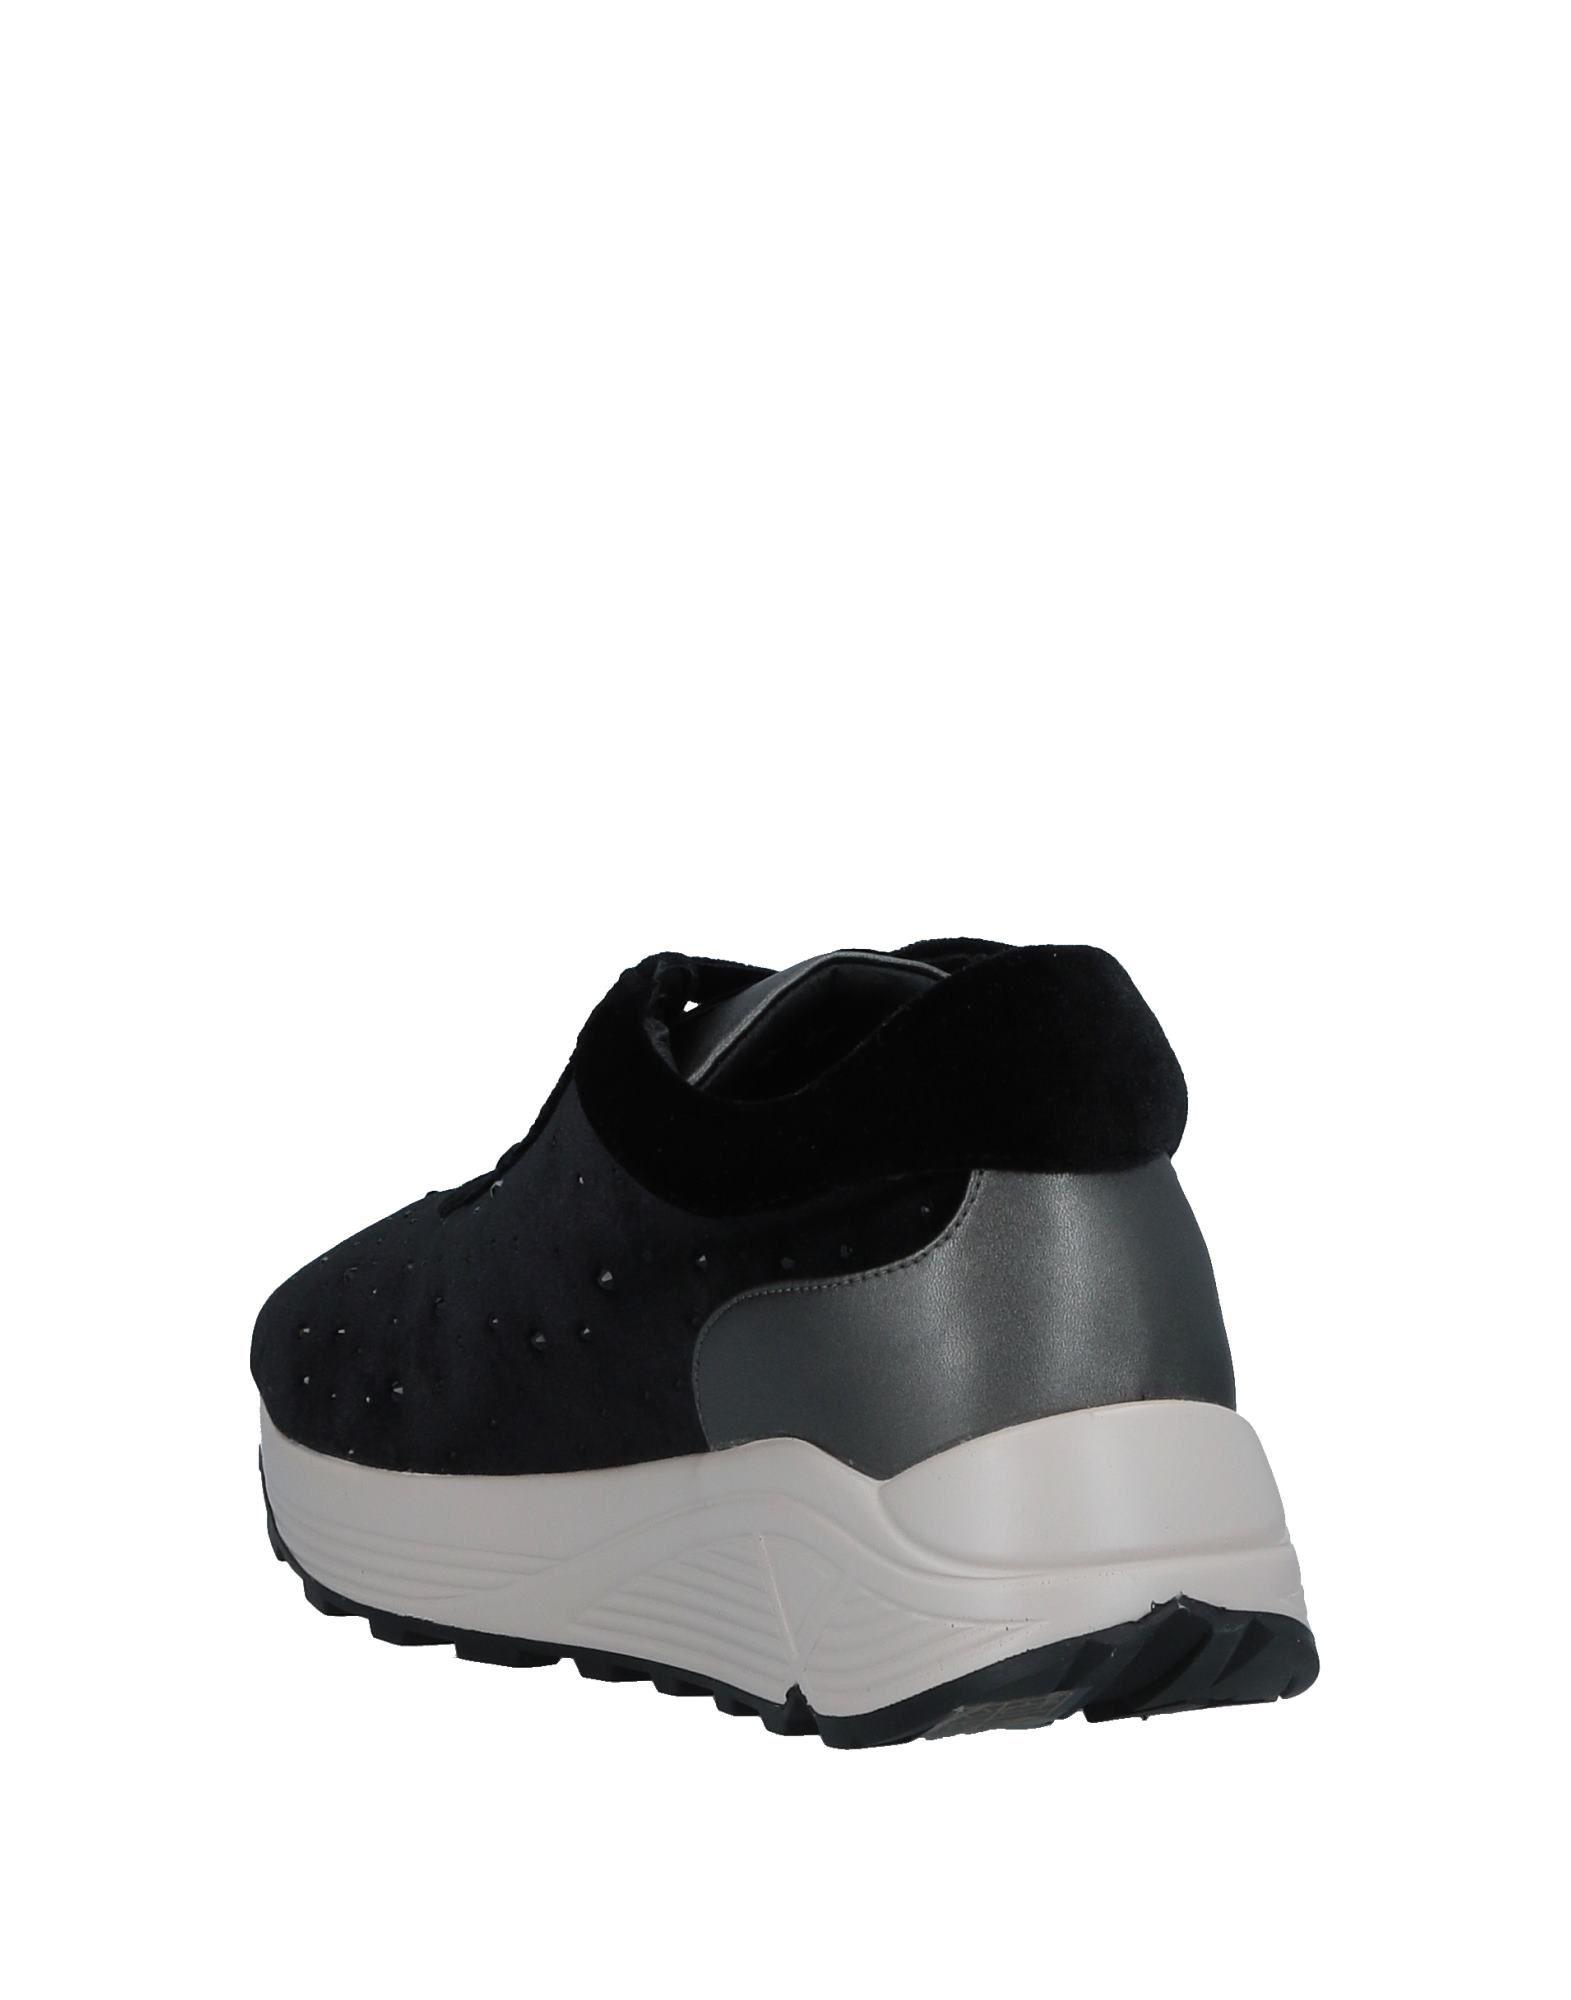 Roberto Della Croce beliebte Sneakers Damen  11531176RP Gute Qualität beliebte Croce Schuhe 086b6a